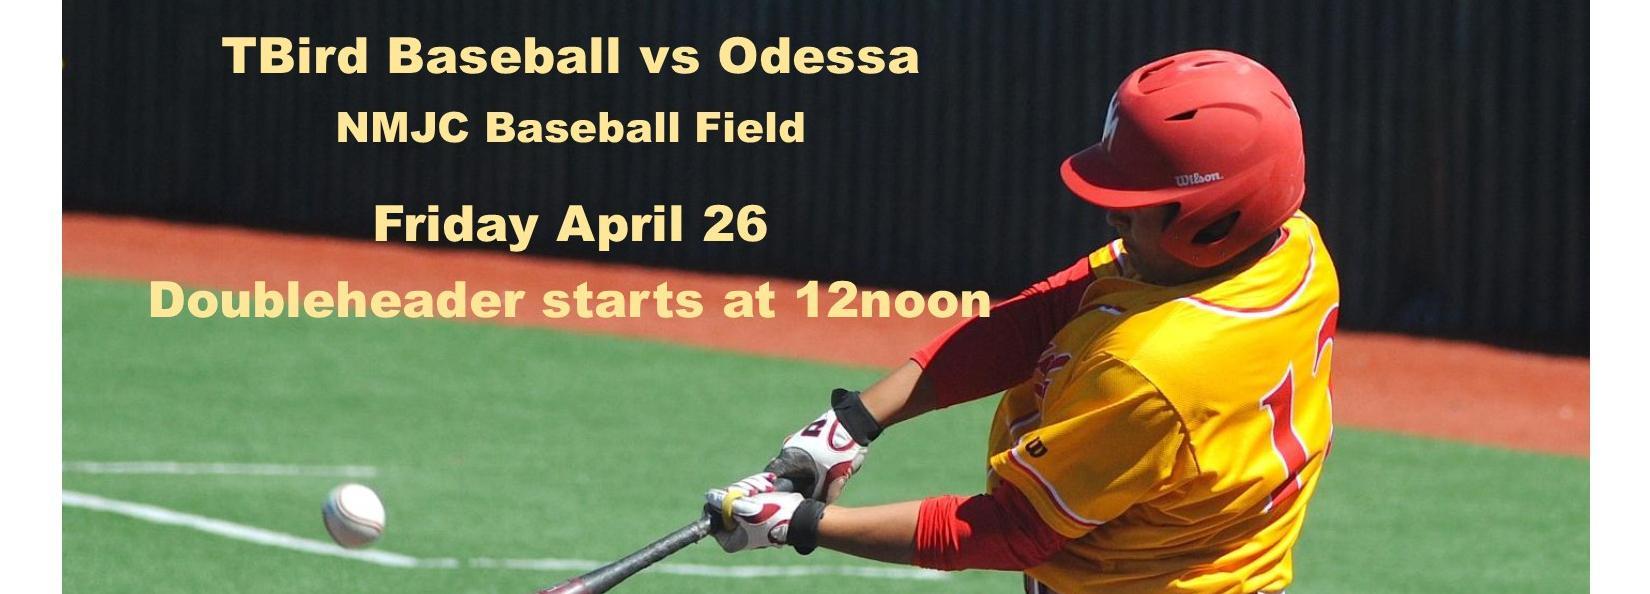 Watch the TBirds vs Odessa College